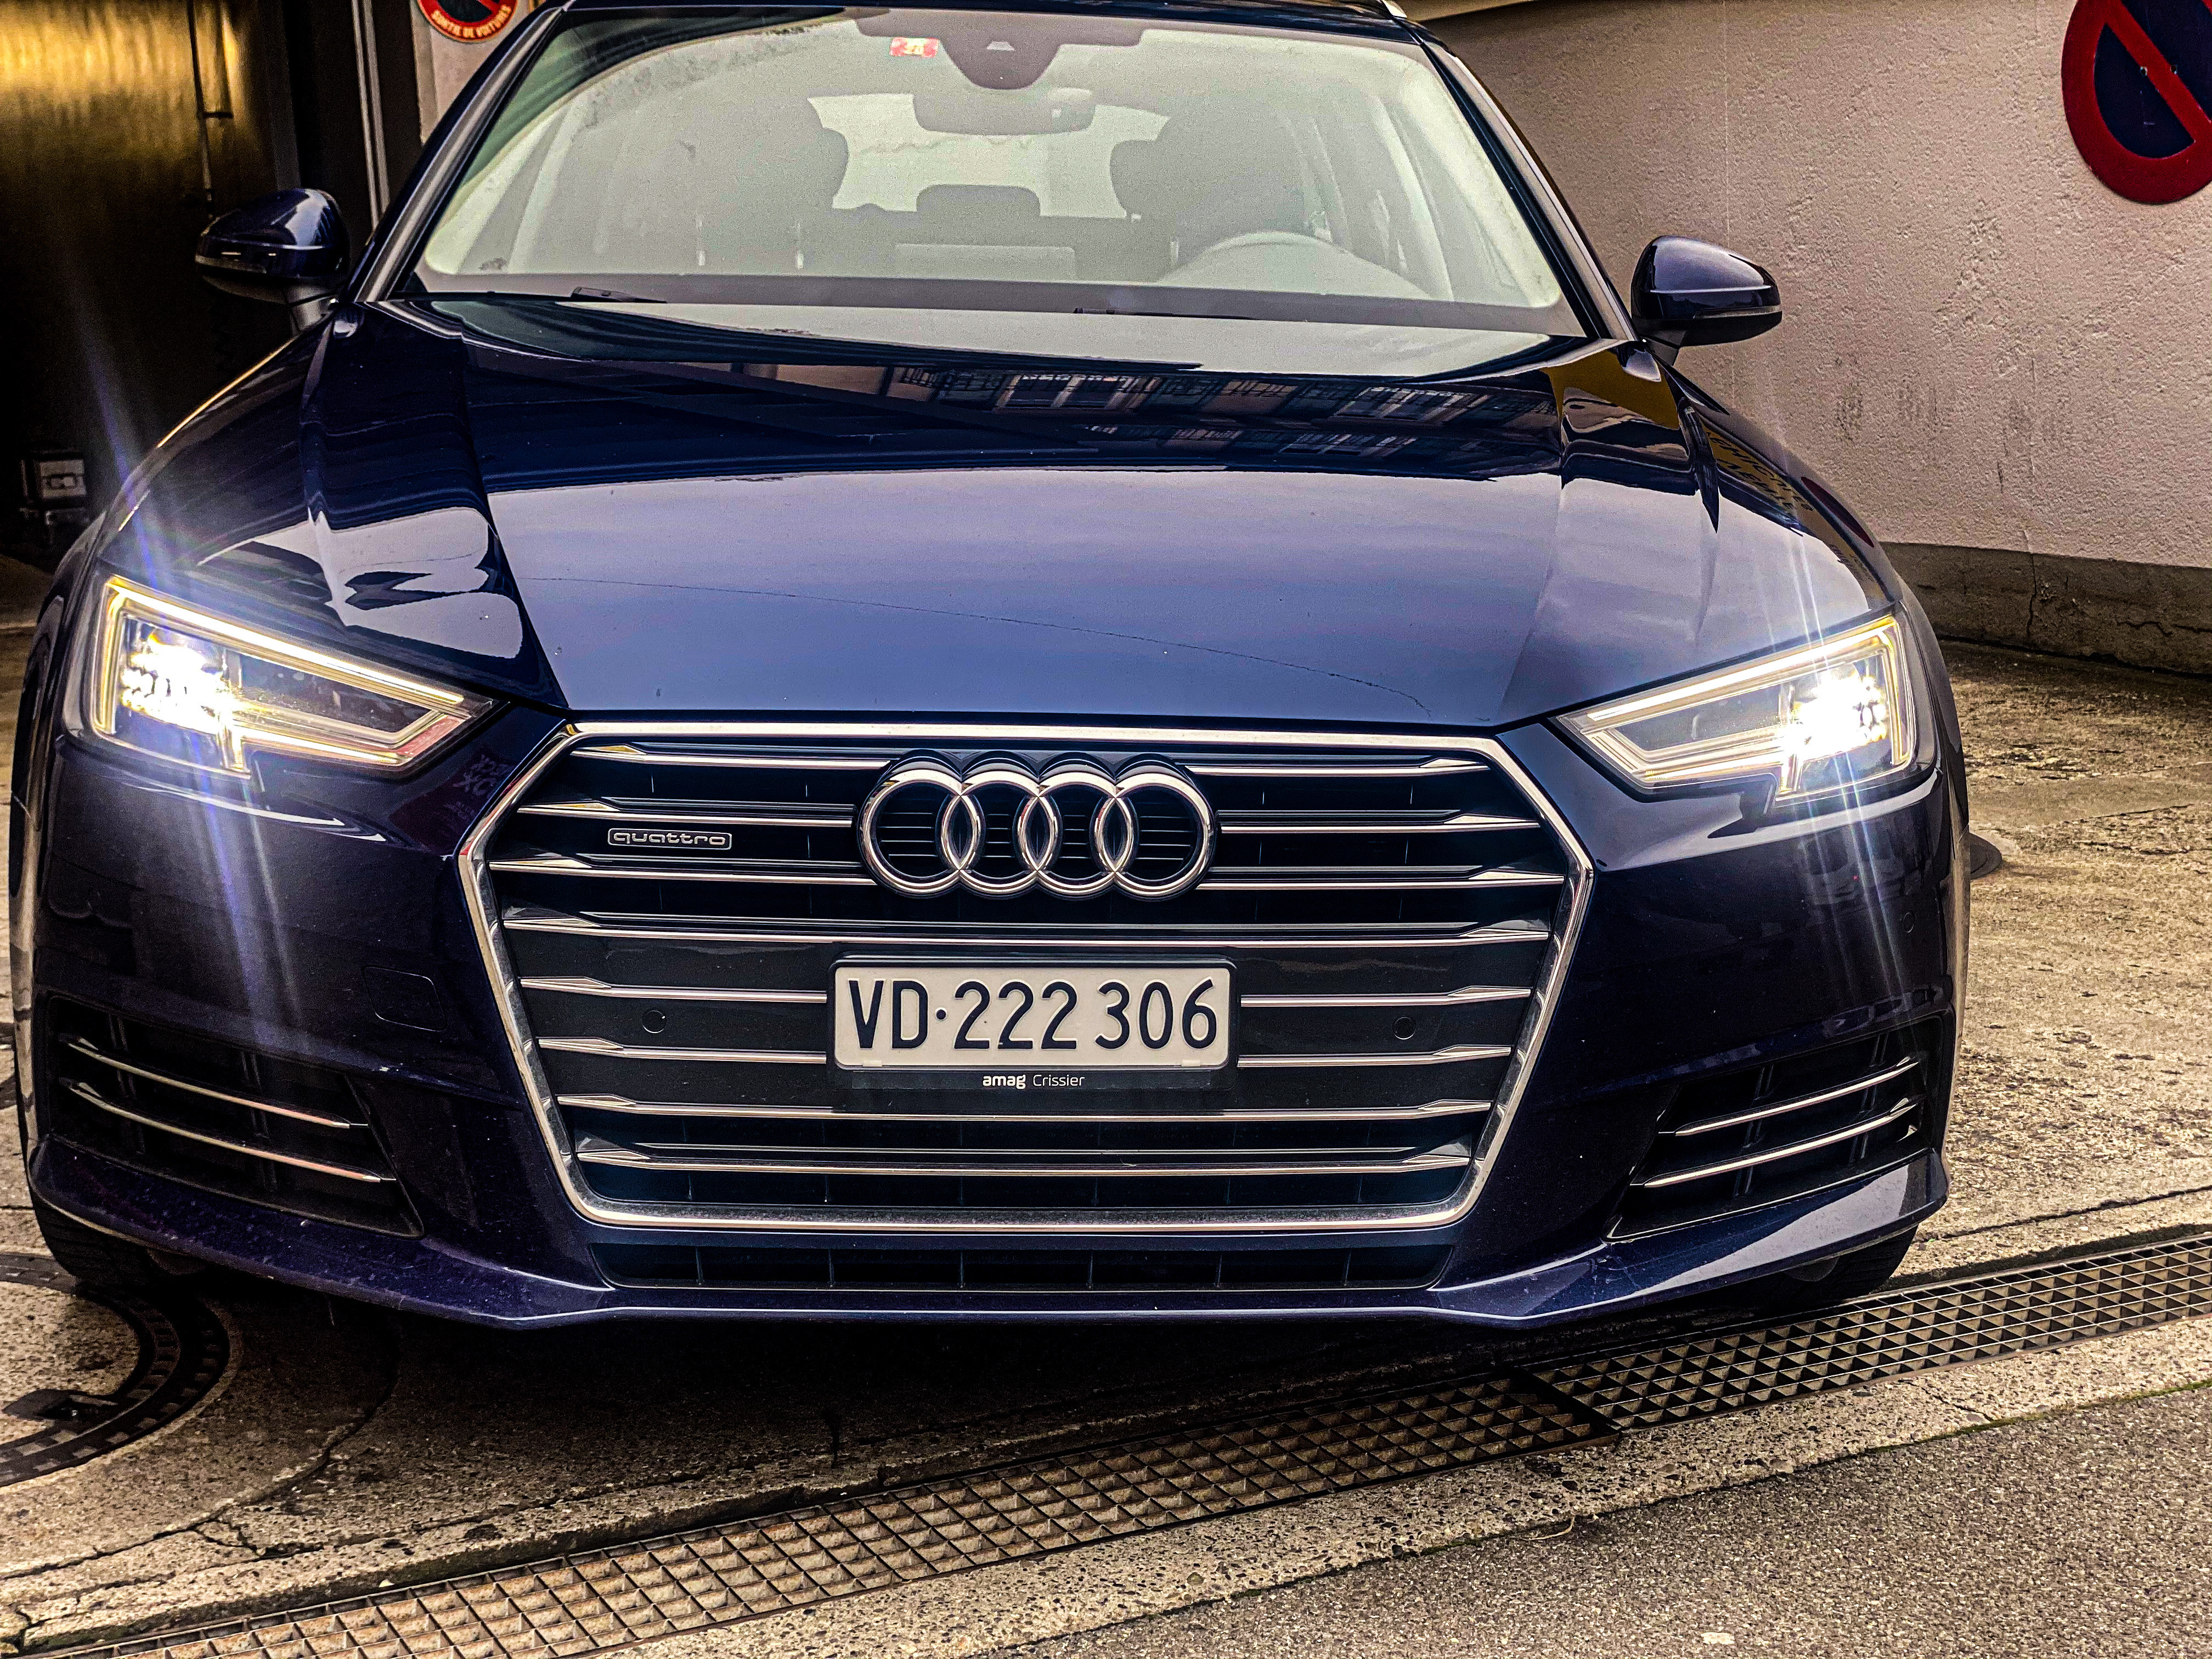 Audi A4 Avant 2.0 TDI 190 quattro S-Tronic